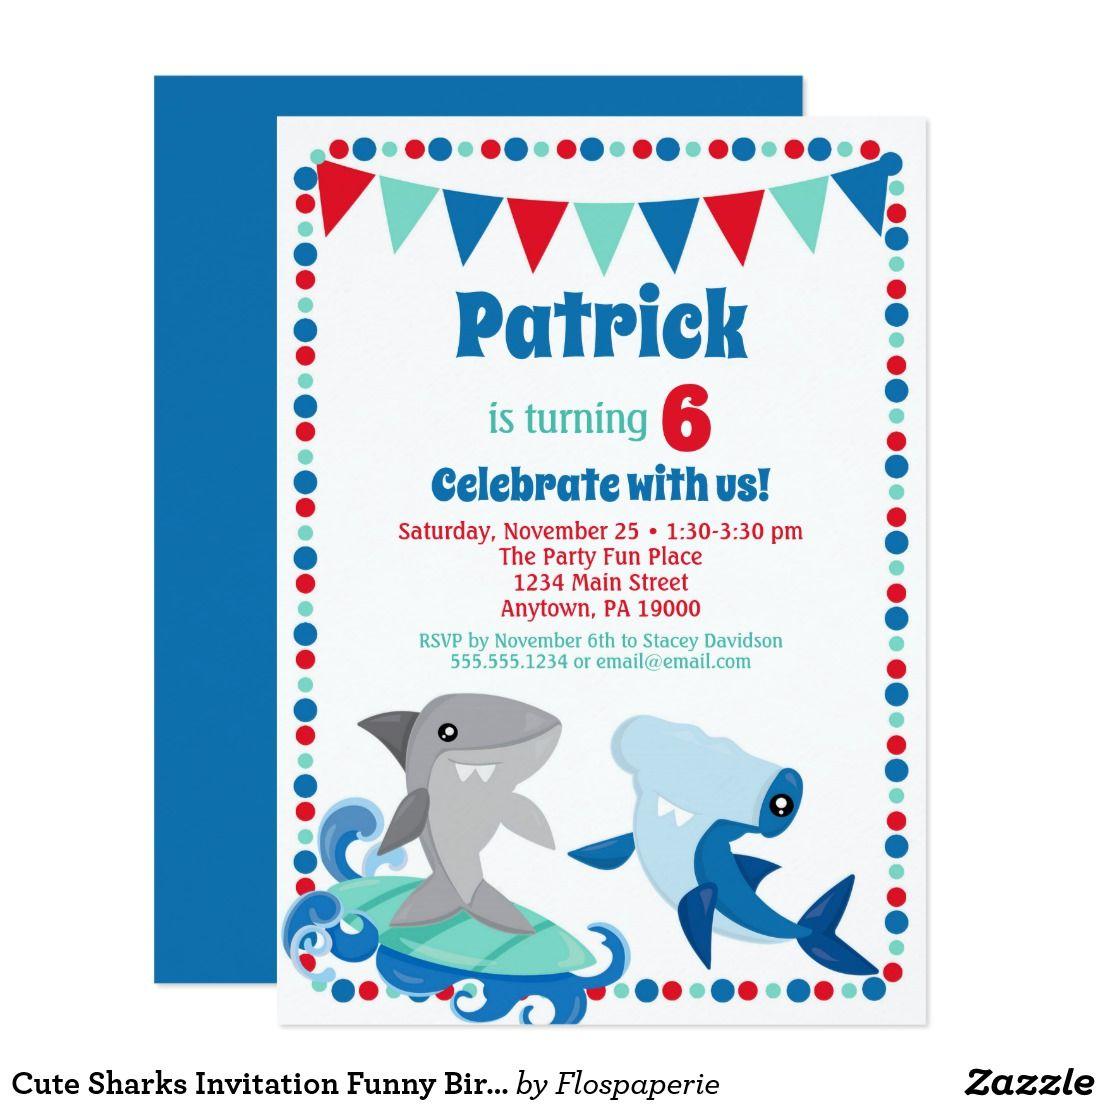 Cute Sharks Invitation Funny Birthday Party | Kids 2-12 Birthday ...